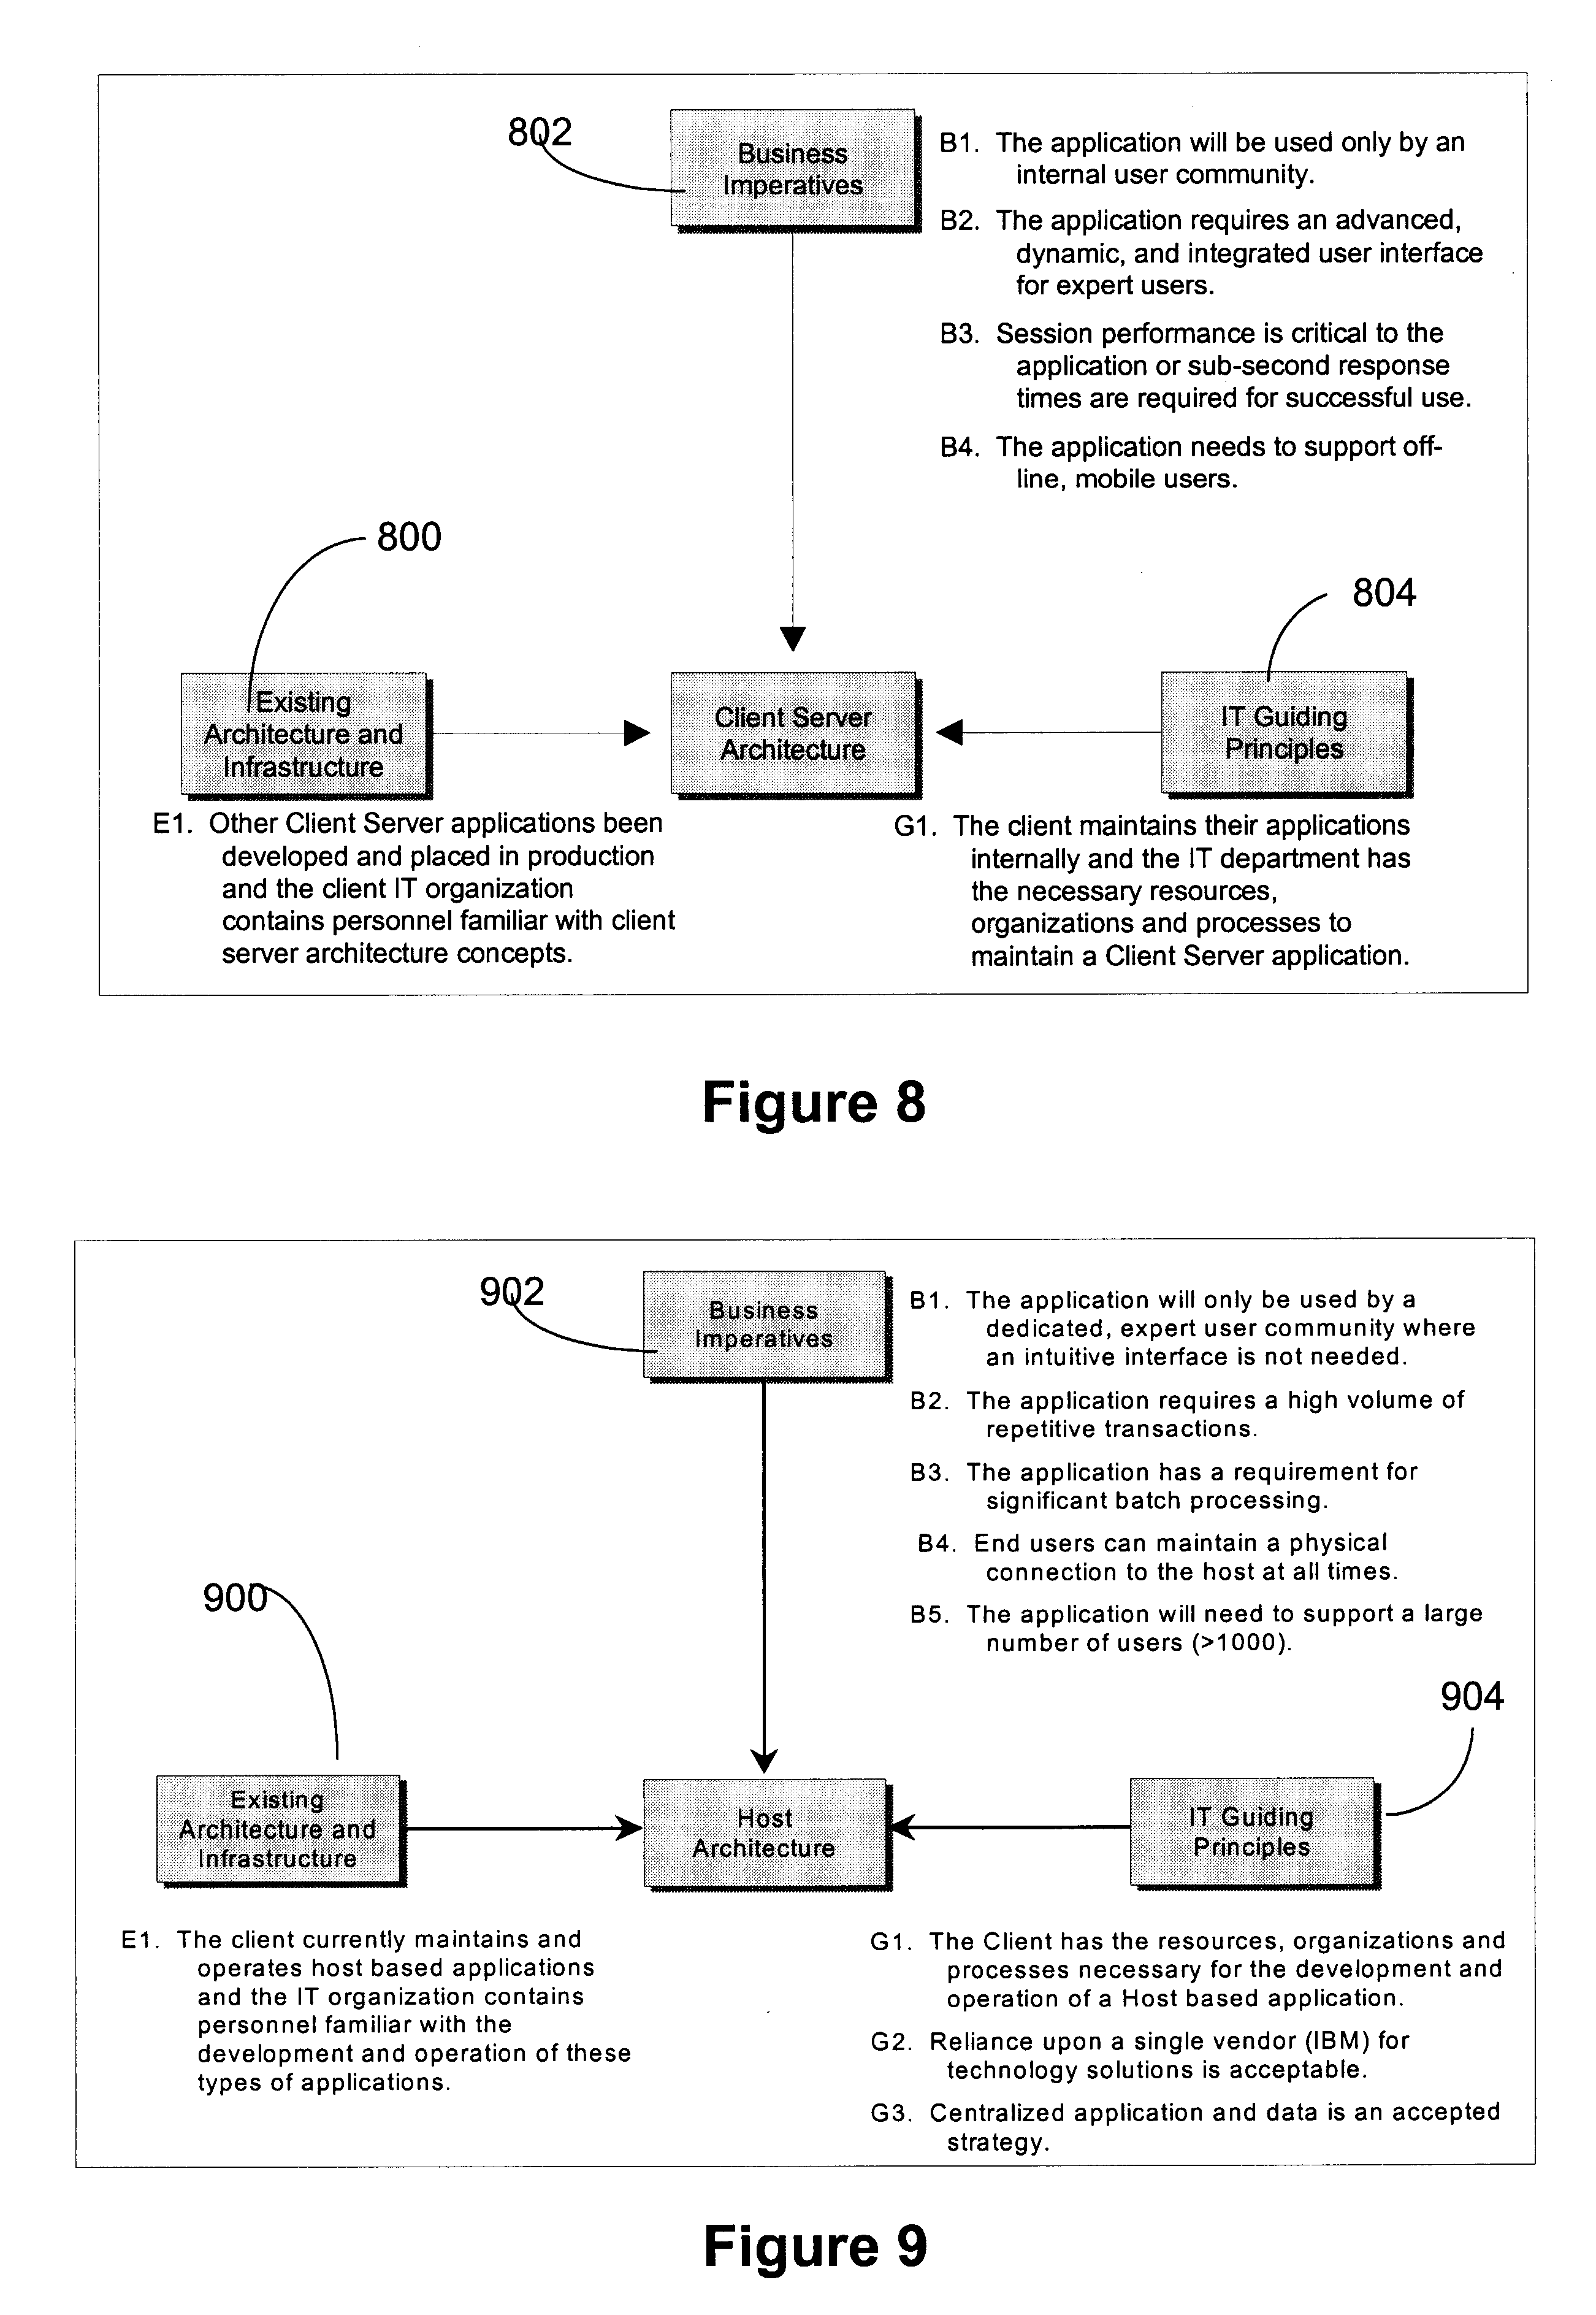 Patent US 6,289,382 B1 on